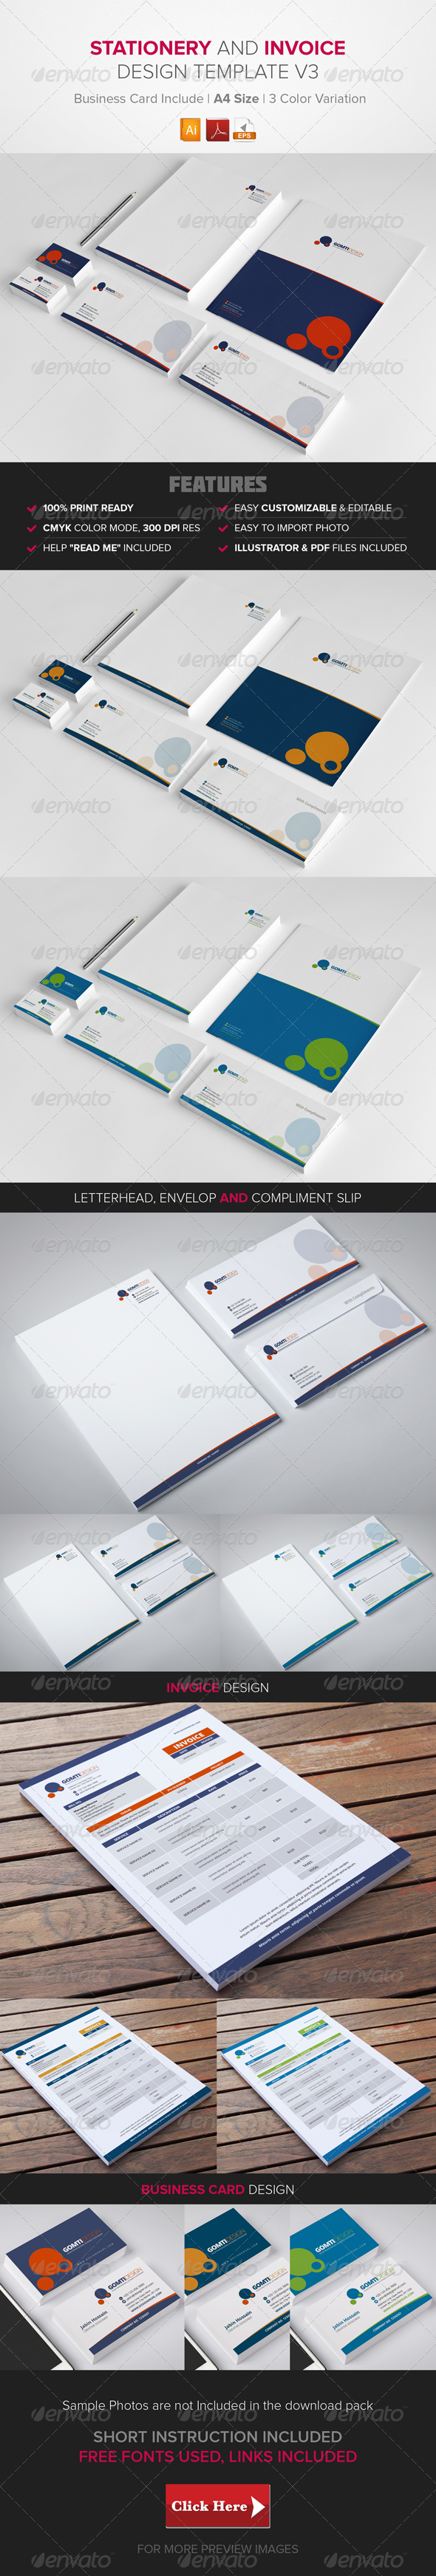 GraphicRiver Stationery & Invoice Design Template v3 8592424